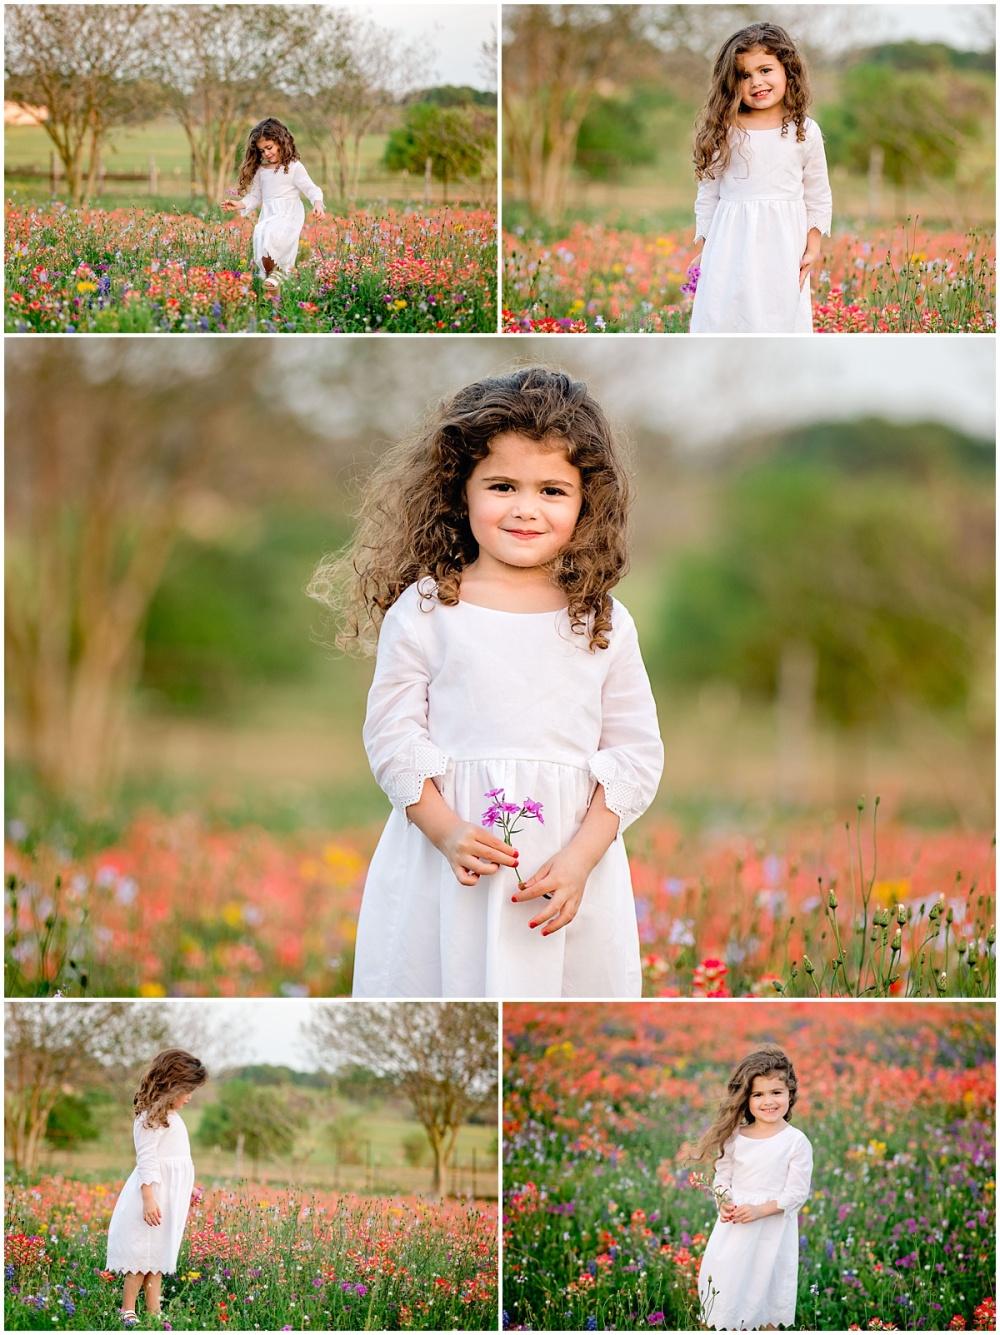 Wildflowers-Texas-Bluebonnets-Spring-Birthday-Photo-Session-Kids-Carly-Barton-Photography_0007.jpg